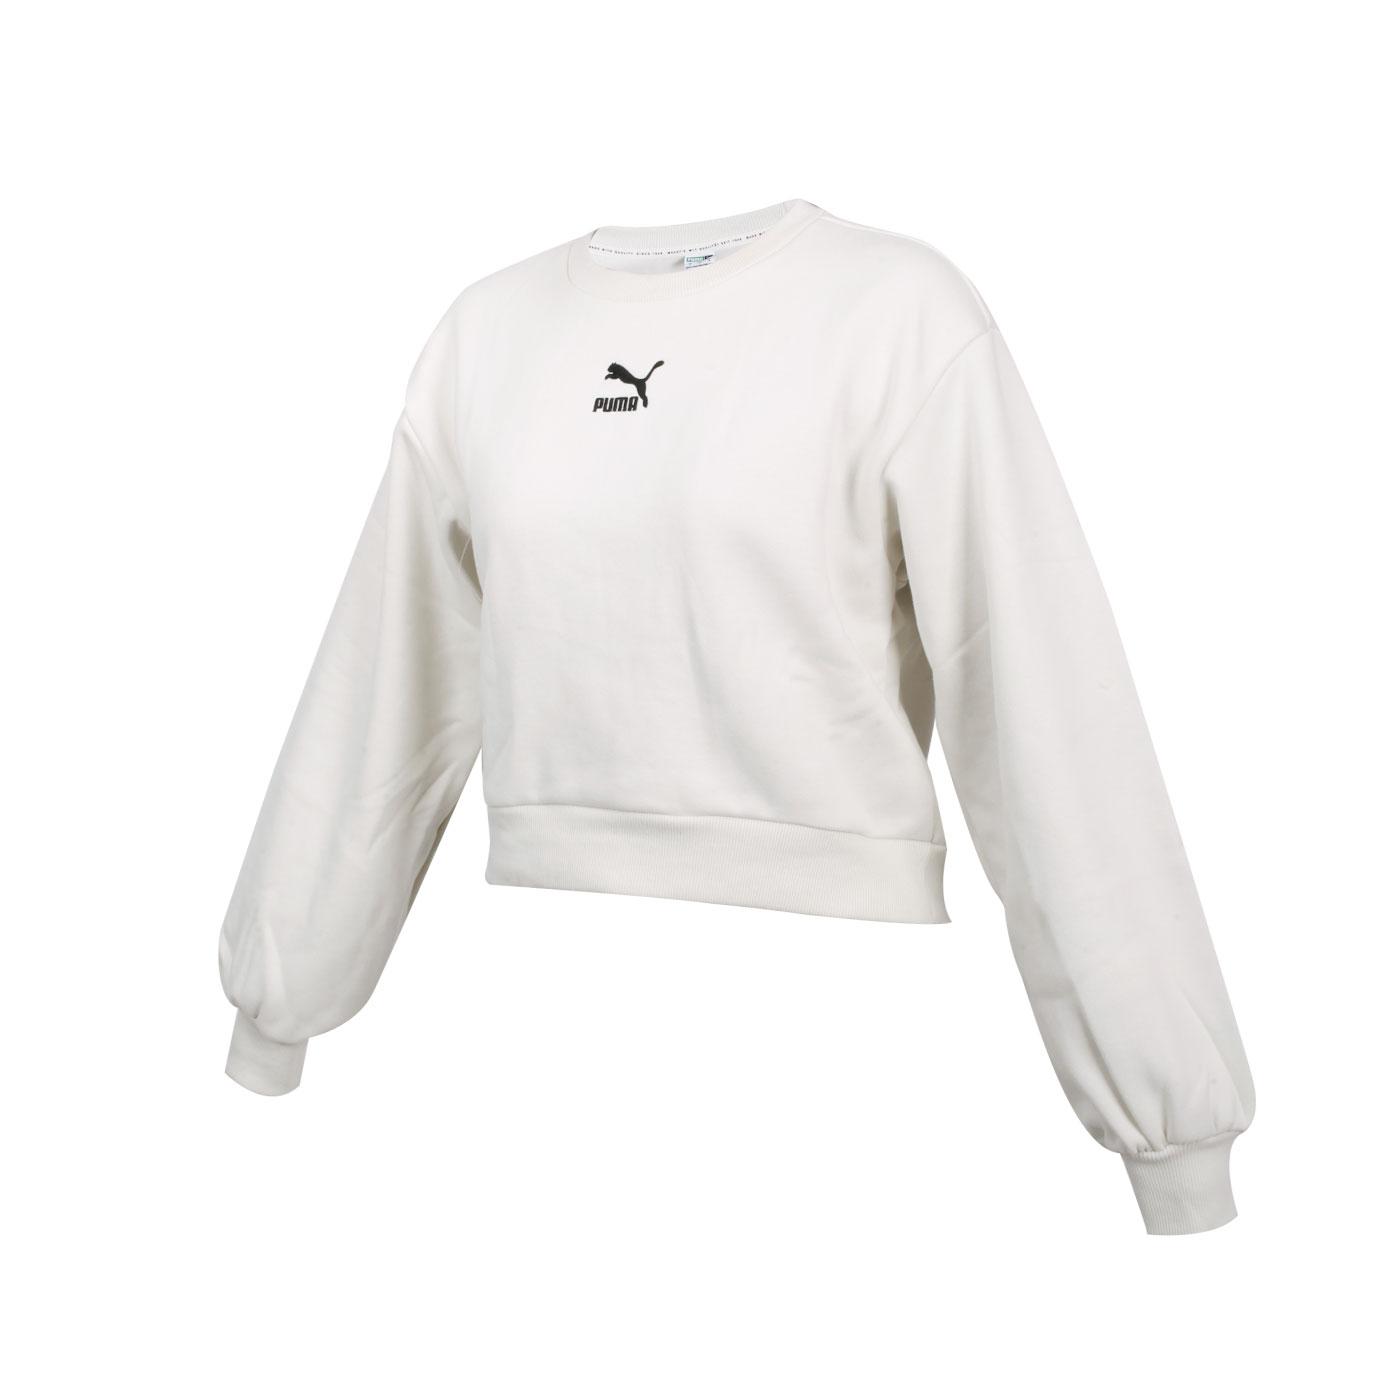 PUMA 女款圓領長袖T恤 53027705 - 米白黑